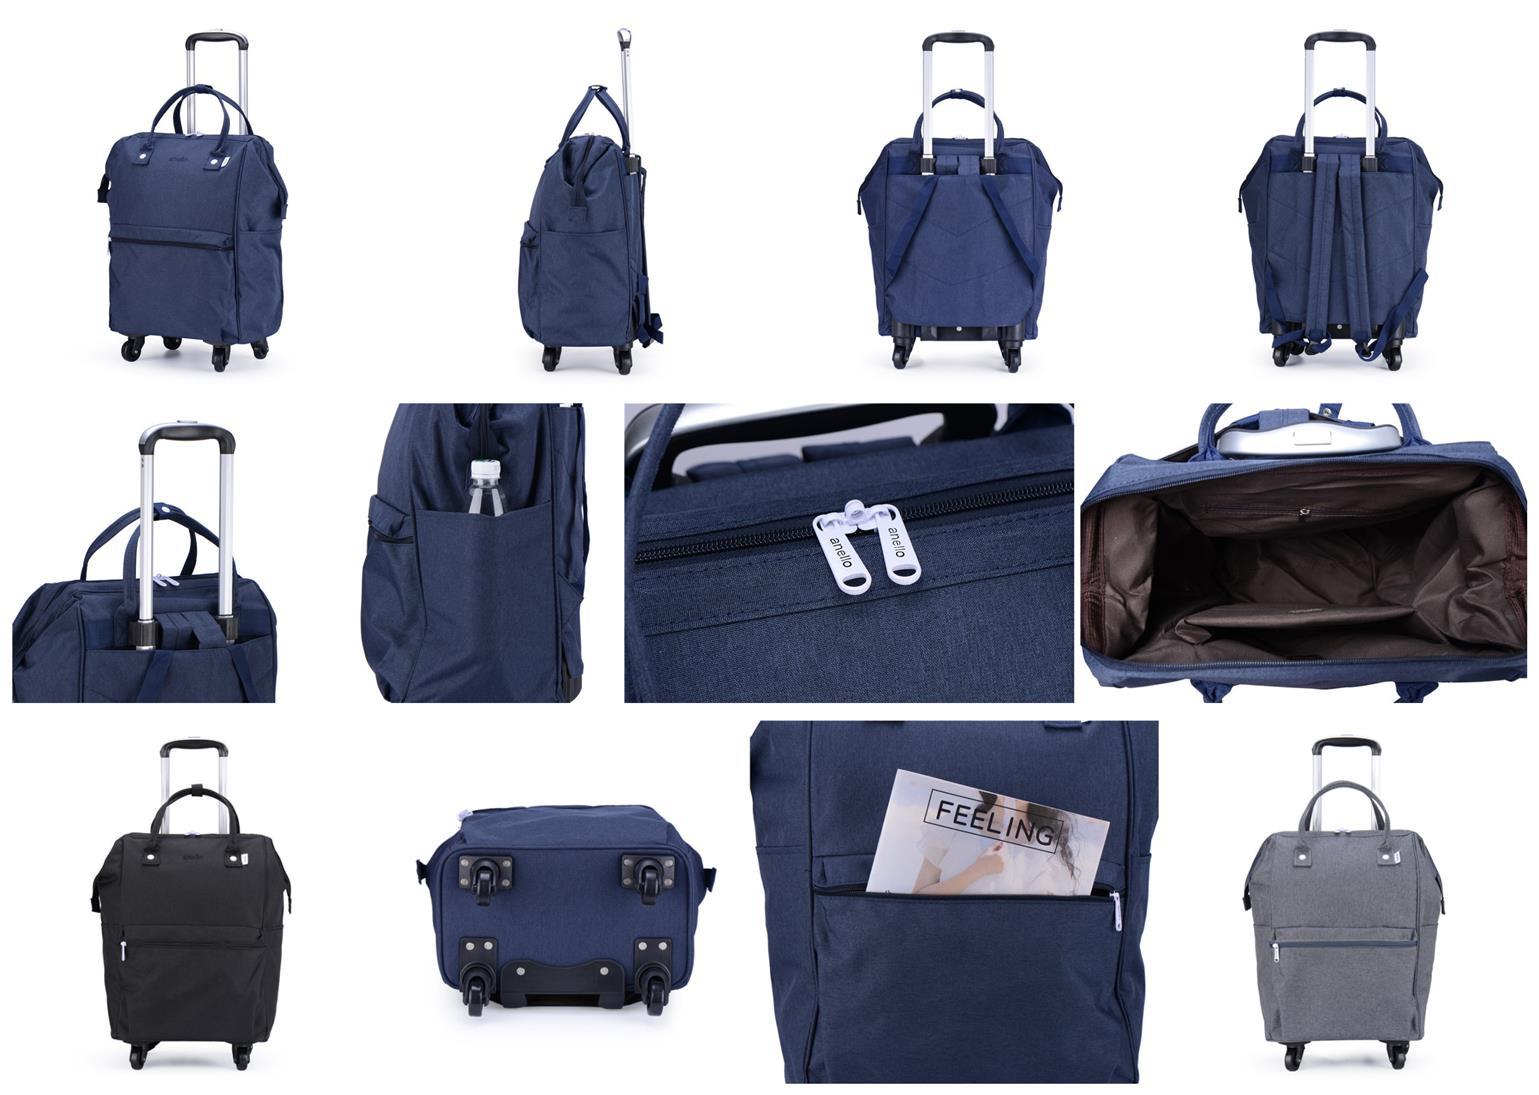 4 Wheels Luggage Travel Cabin Size (end 11 22 2019 8 39 PM) b73e7a1e3234c